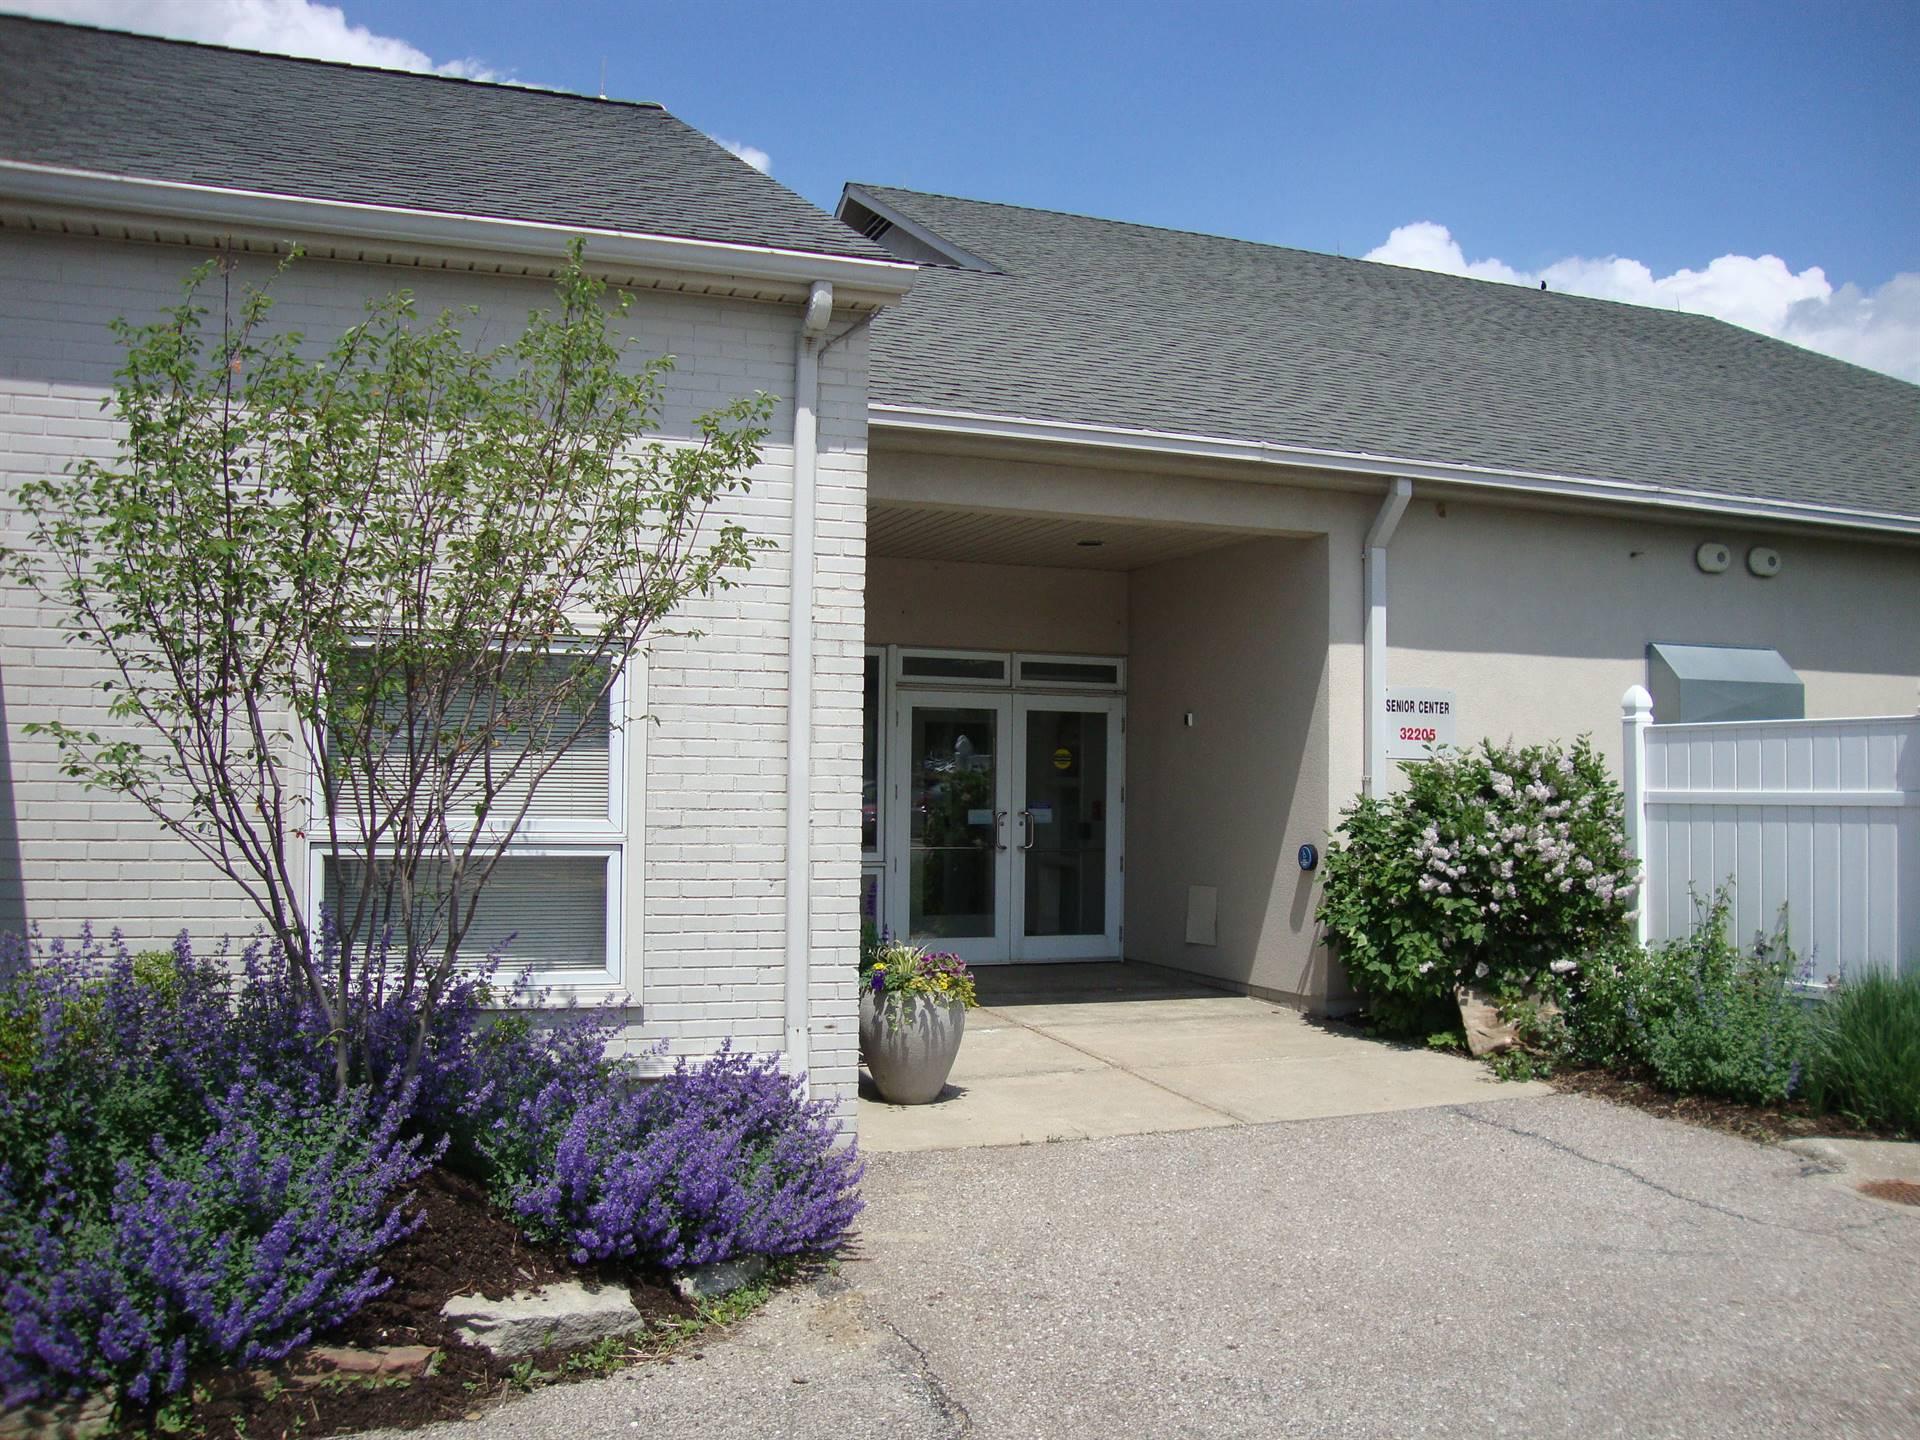 Entrance to Orange Senior Center